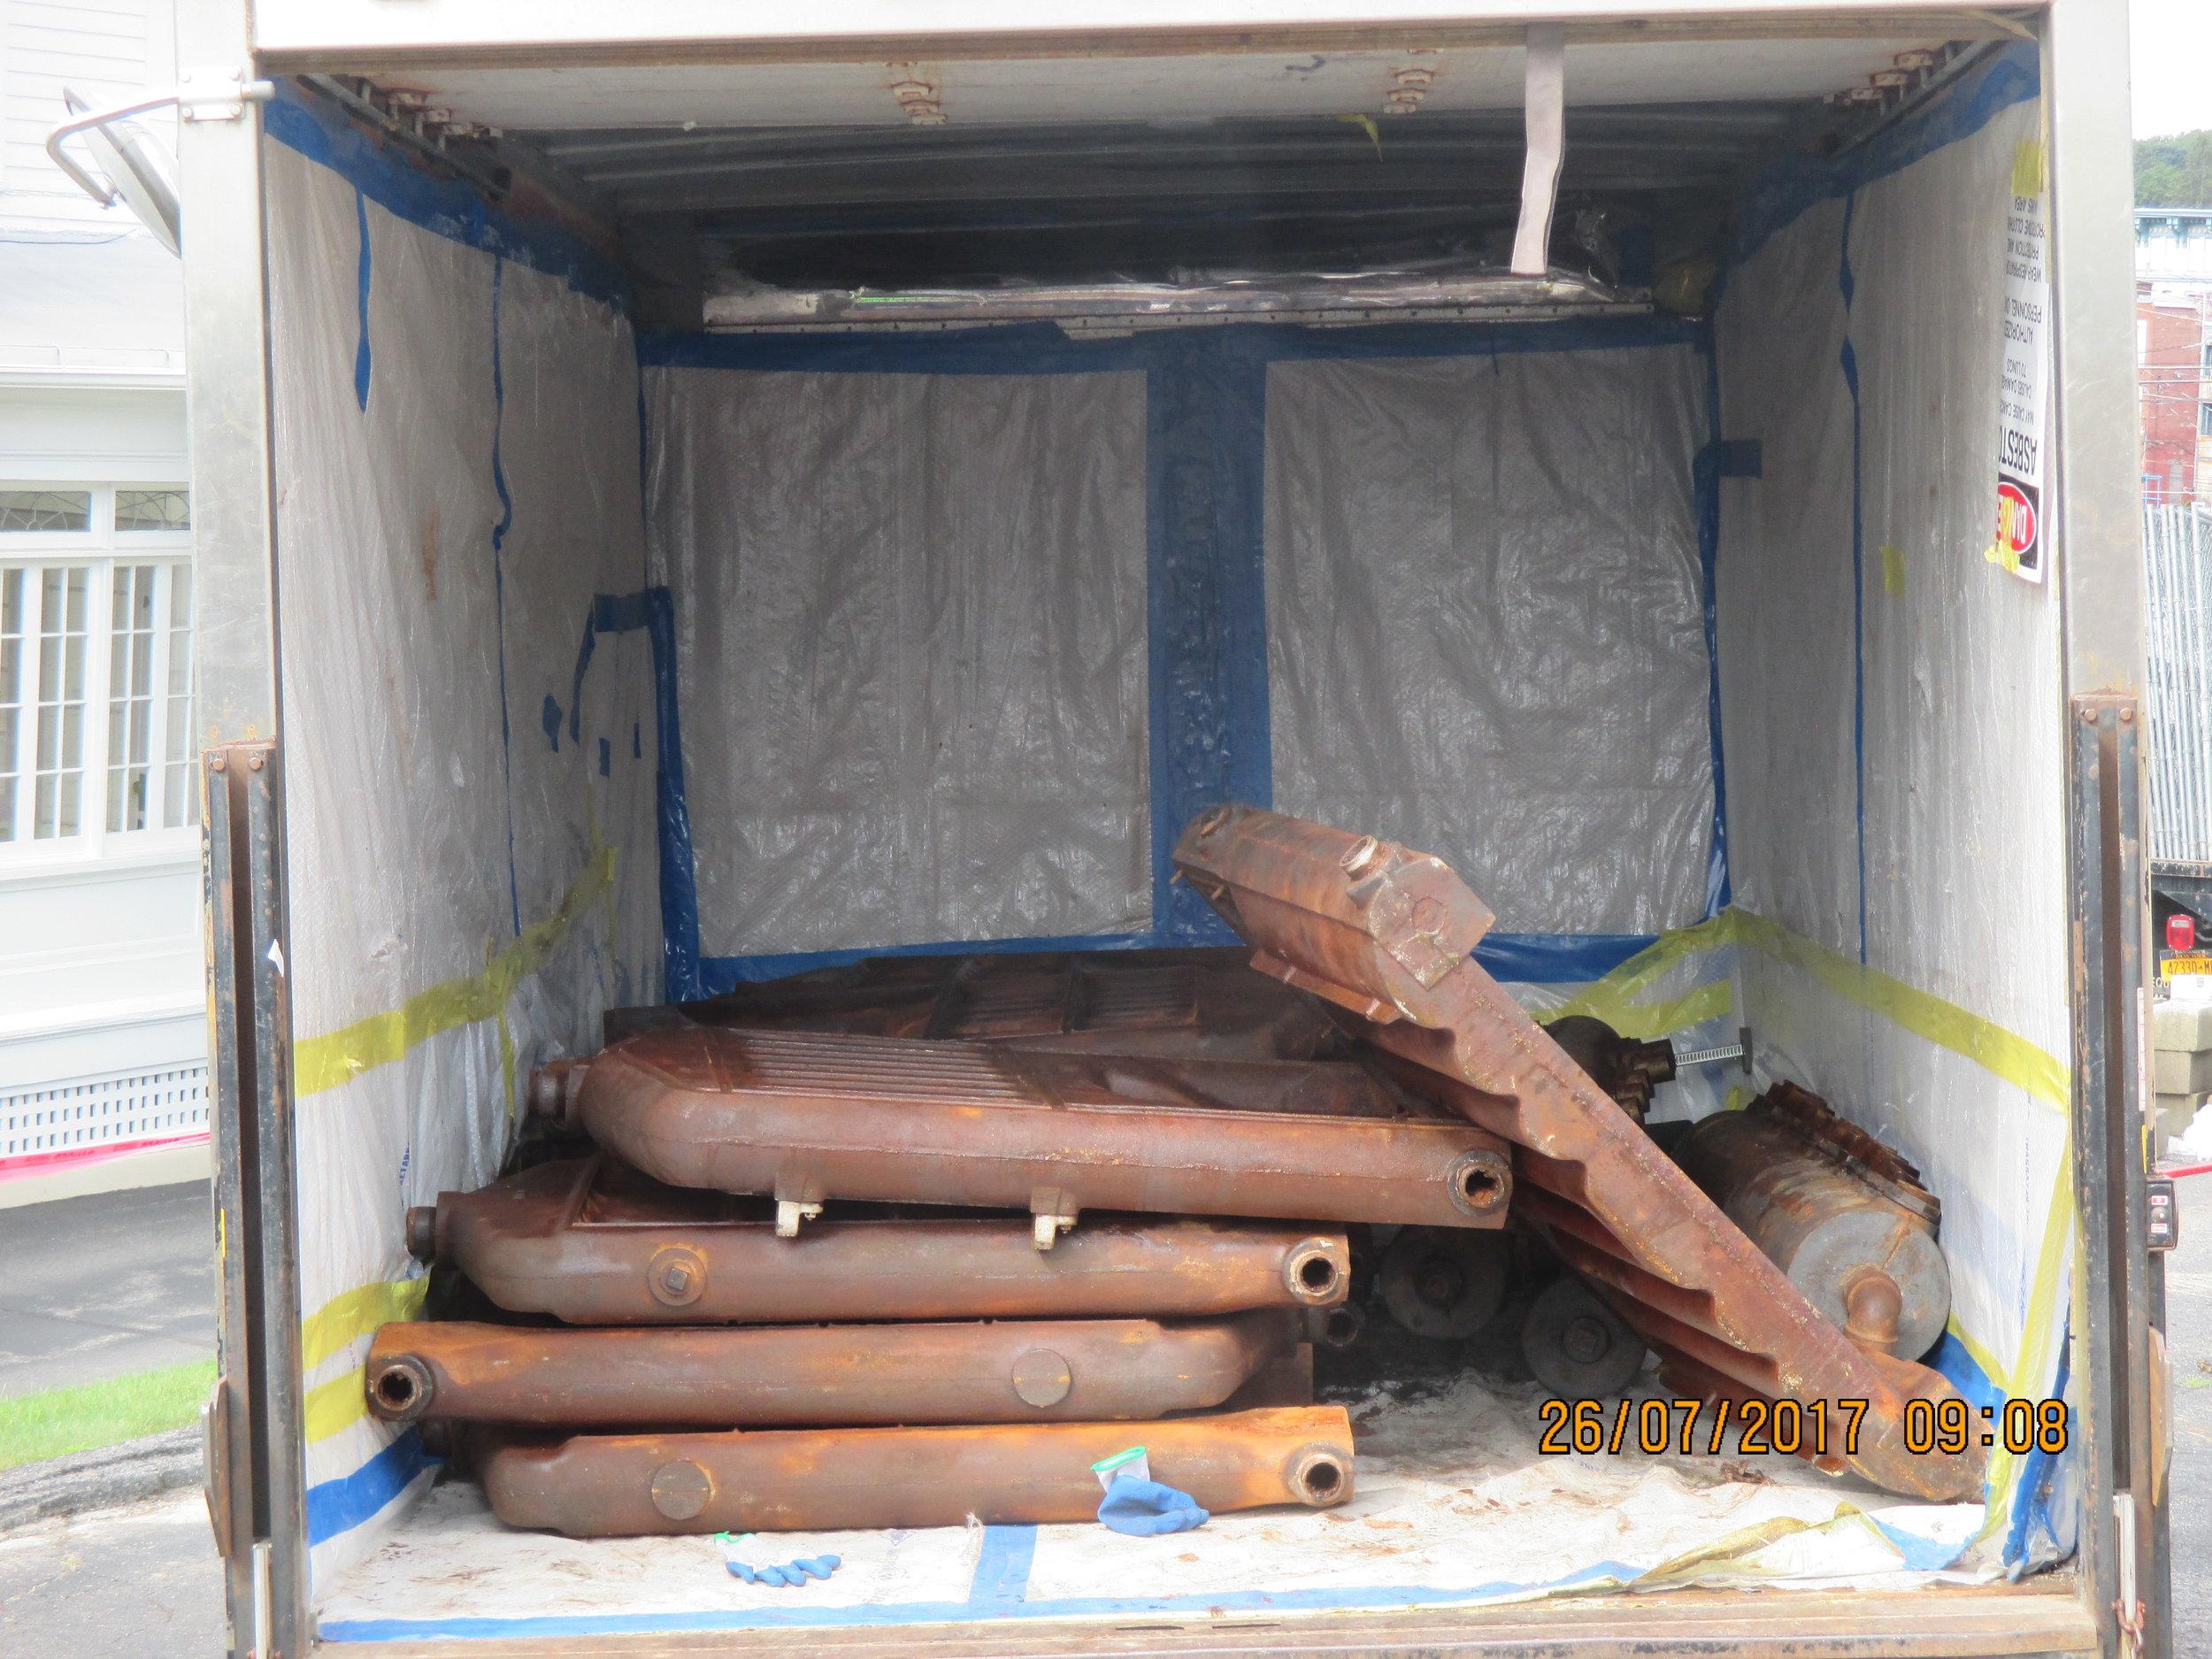 boiler removal 07.26.2017.jpg